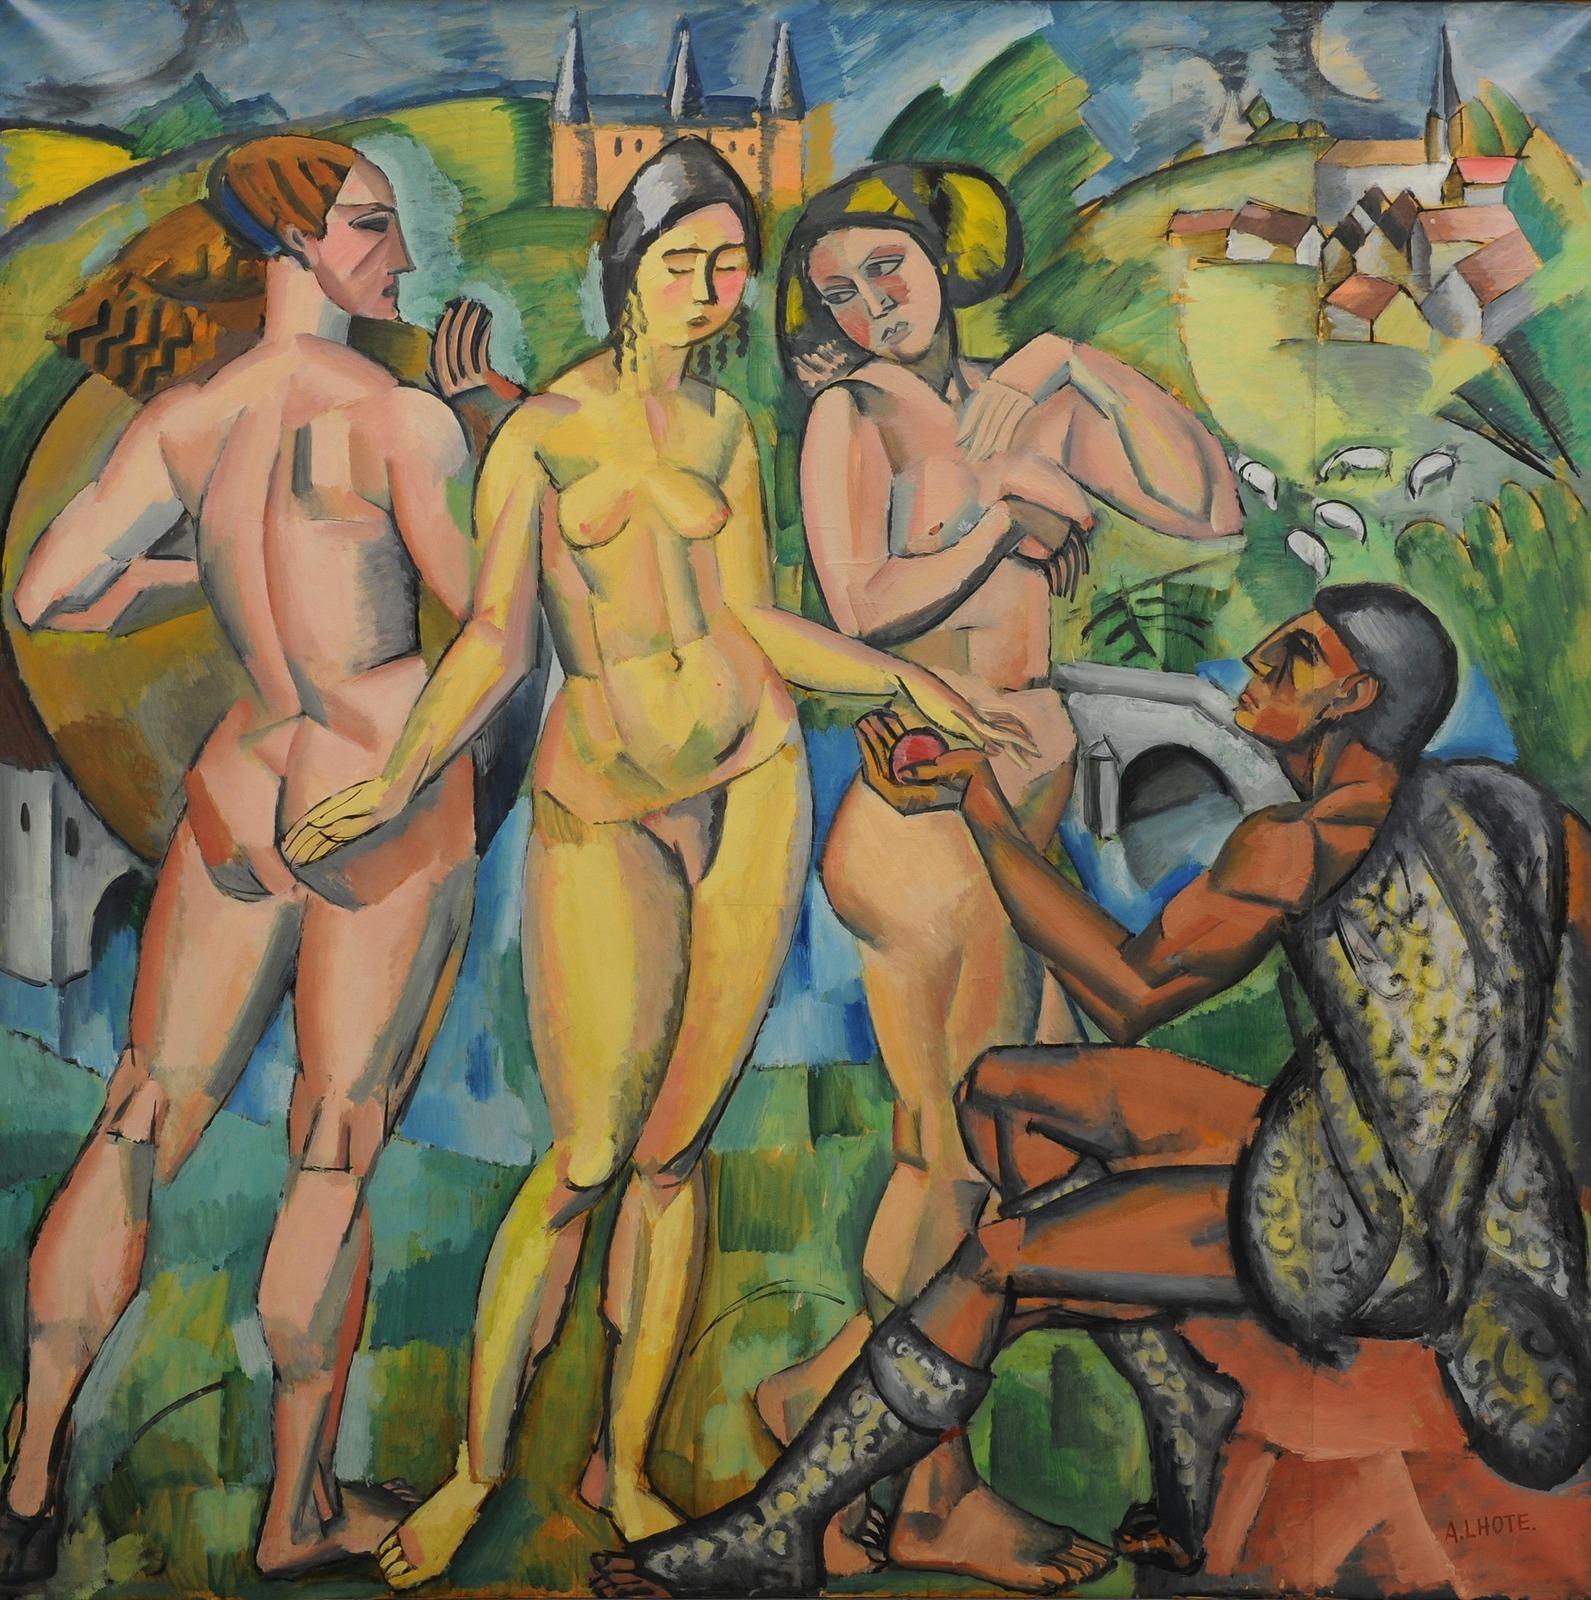 Андре Лот. 1912. Суд Париса (The Judgment of Paris). 180 х 180. Холт, масло. Валанс, Музей искусства и археологии.